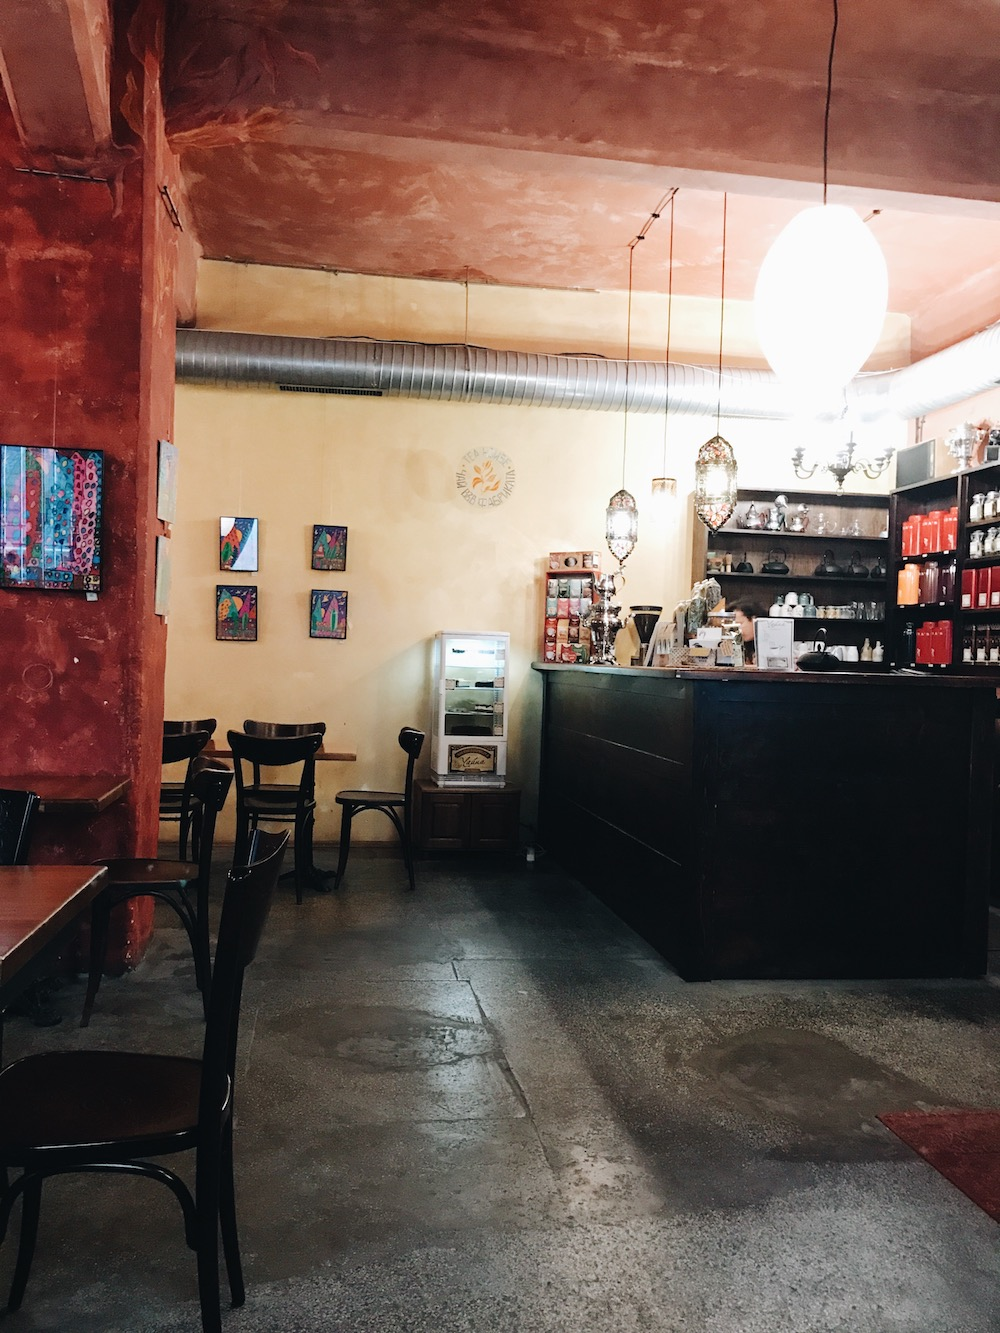 Tea House, Sofia, Bulgaria | Travel Guide by Ruby Josephine